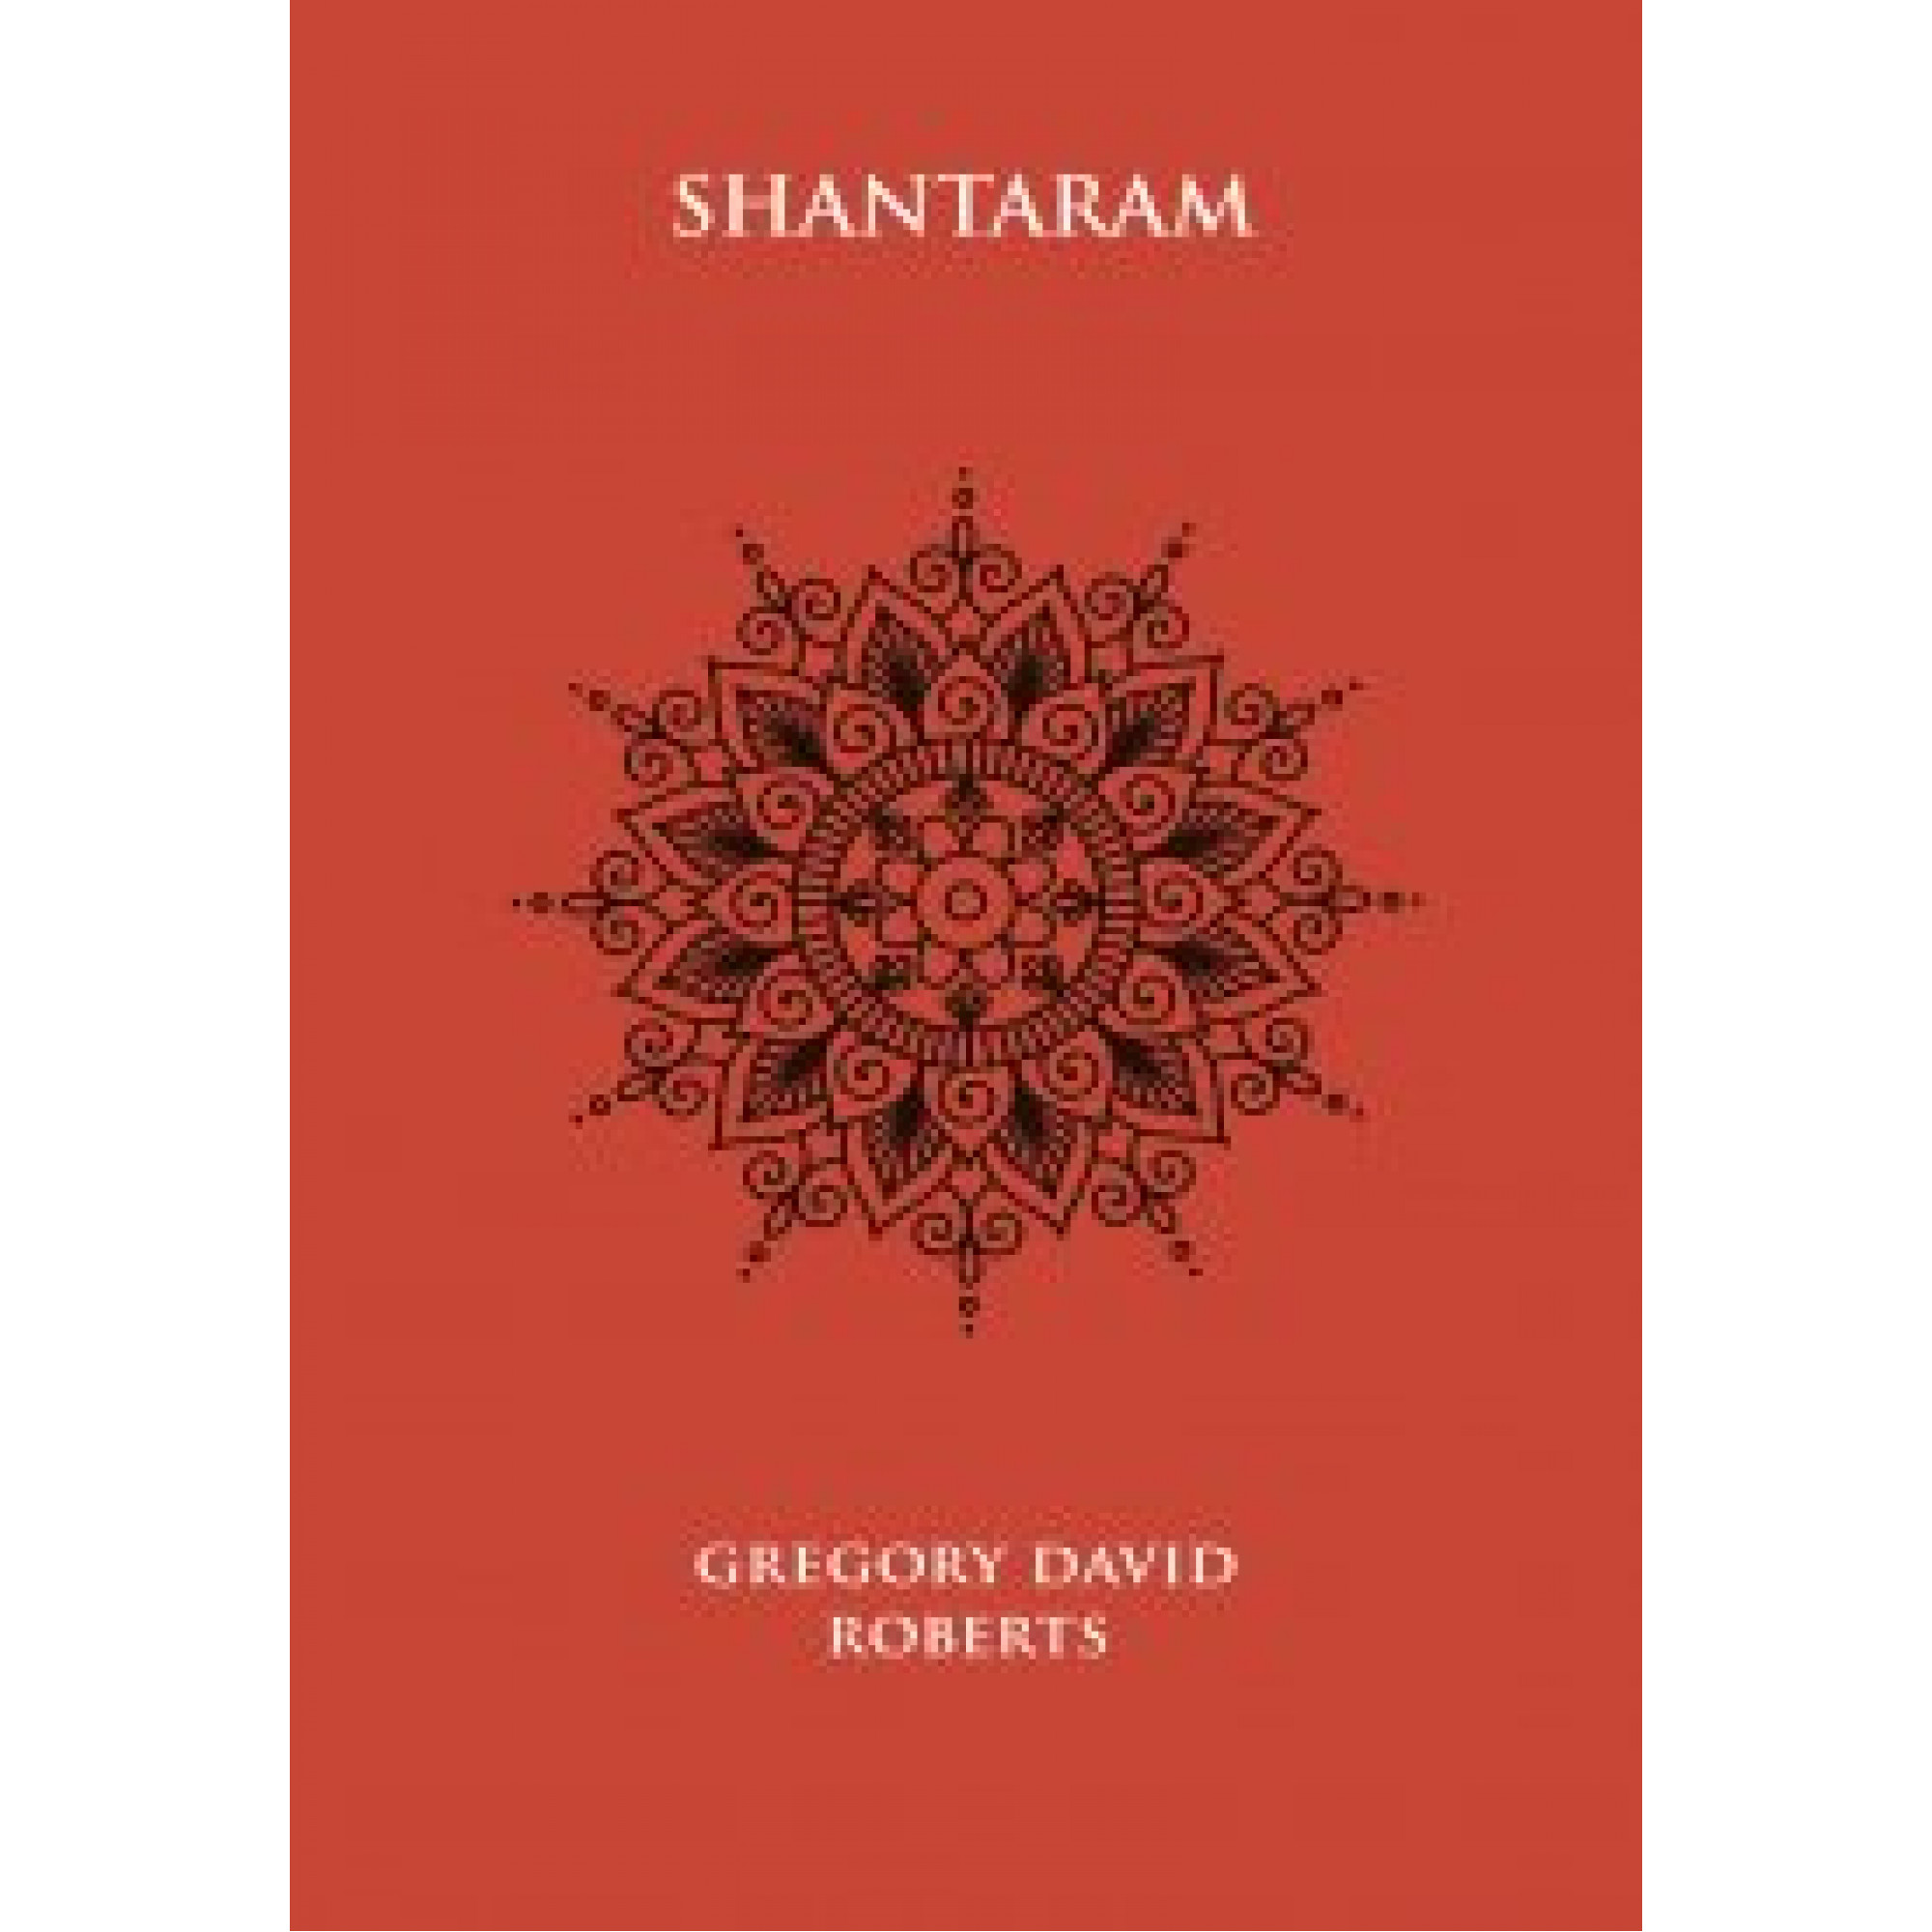 Shantaram; Gregory David Roberts